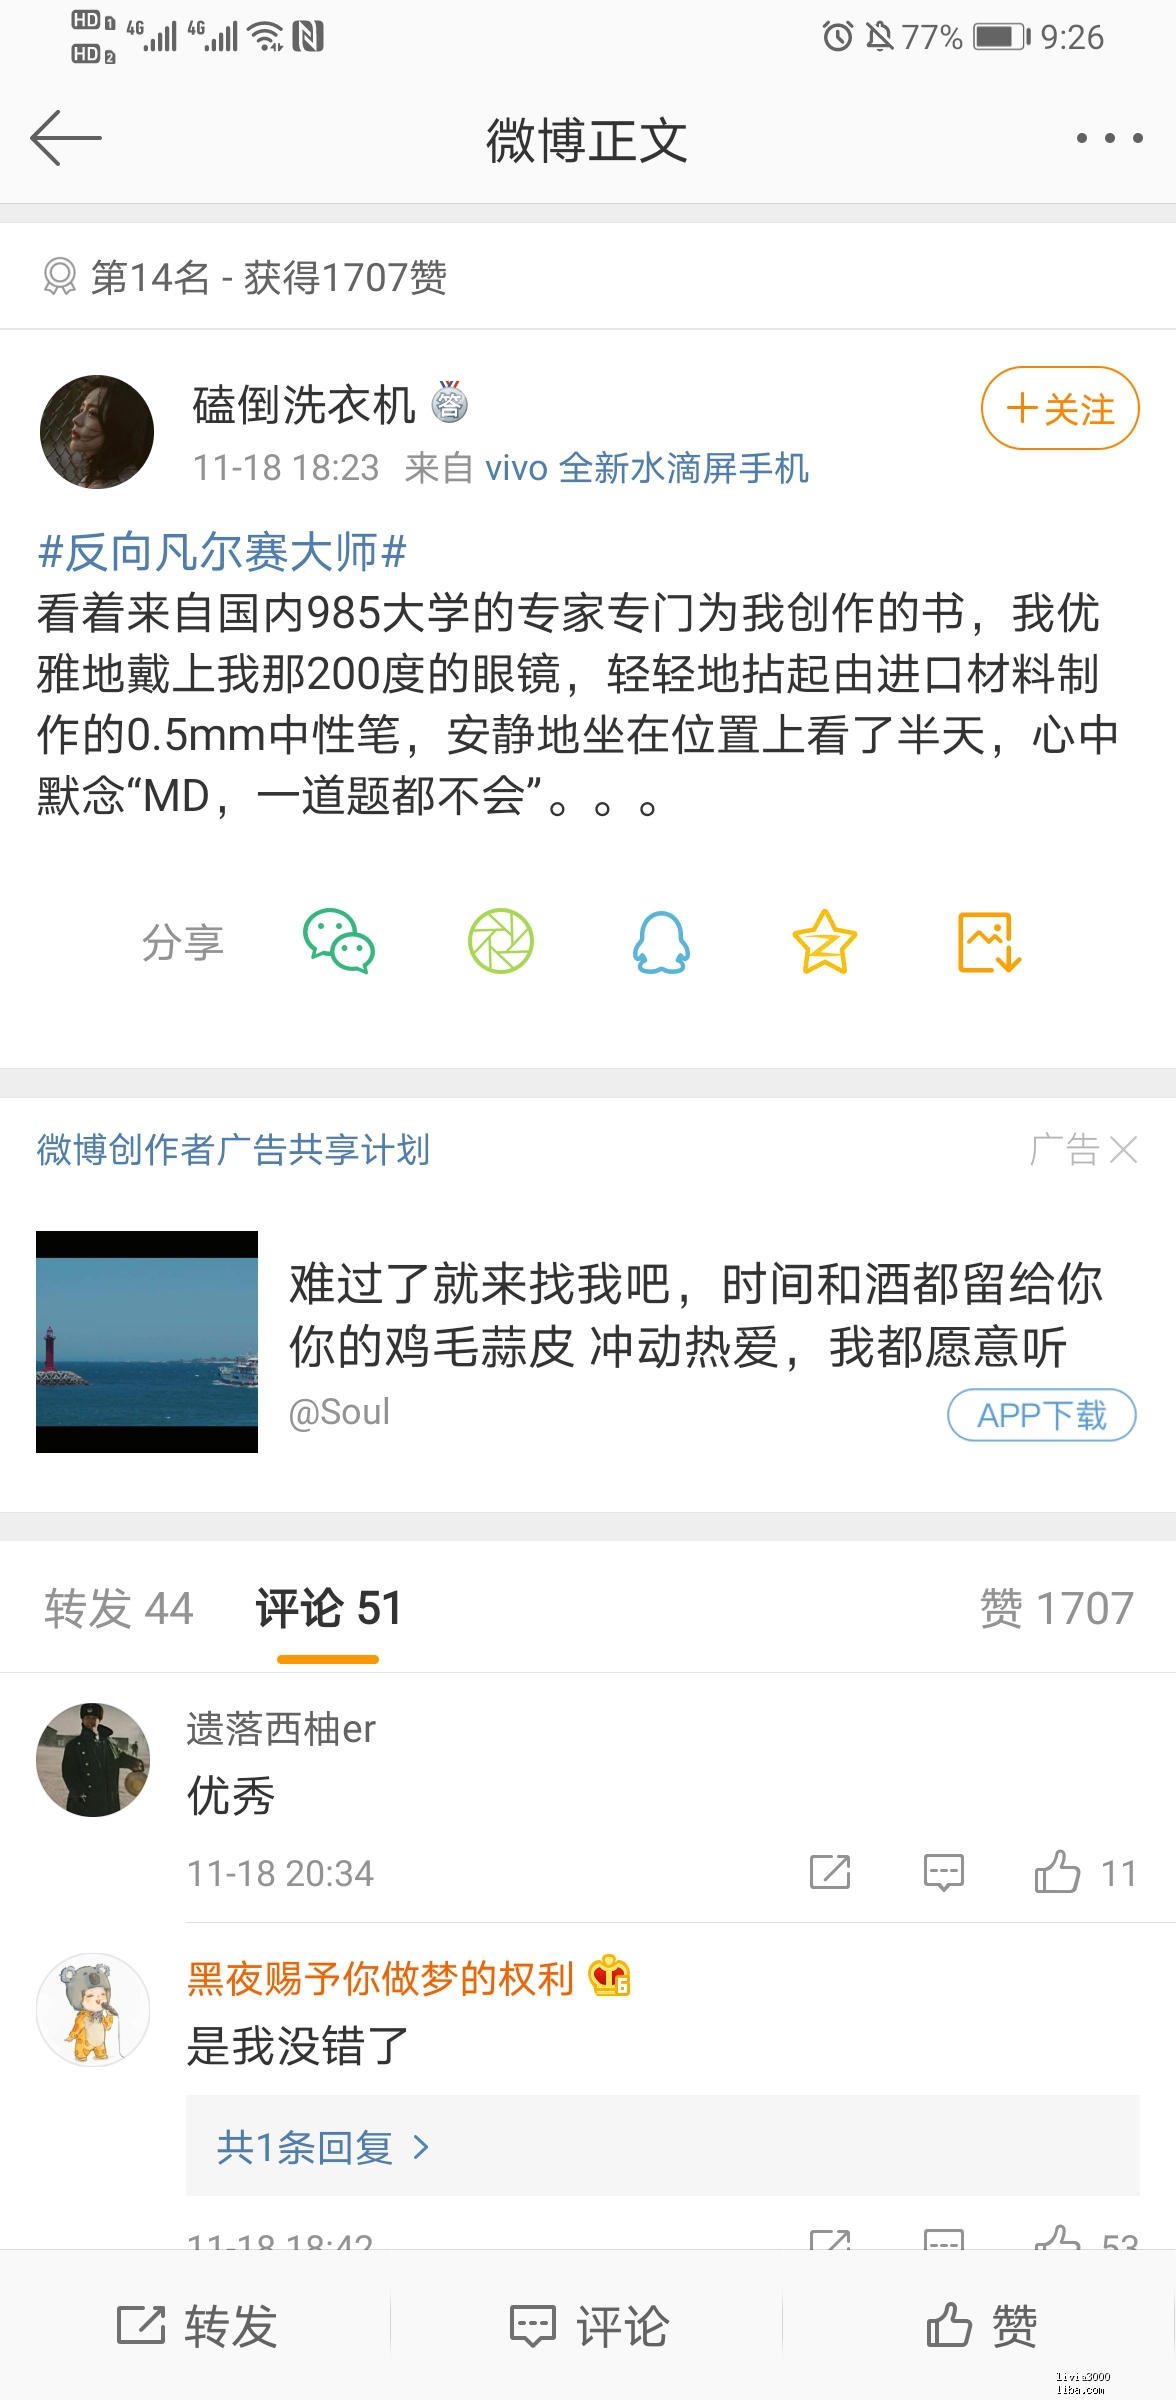 Screenshot_20201119_092616_com.sina.weibo.jpg